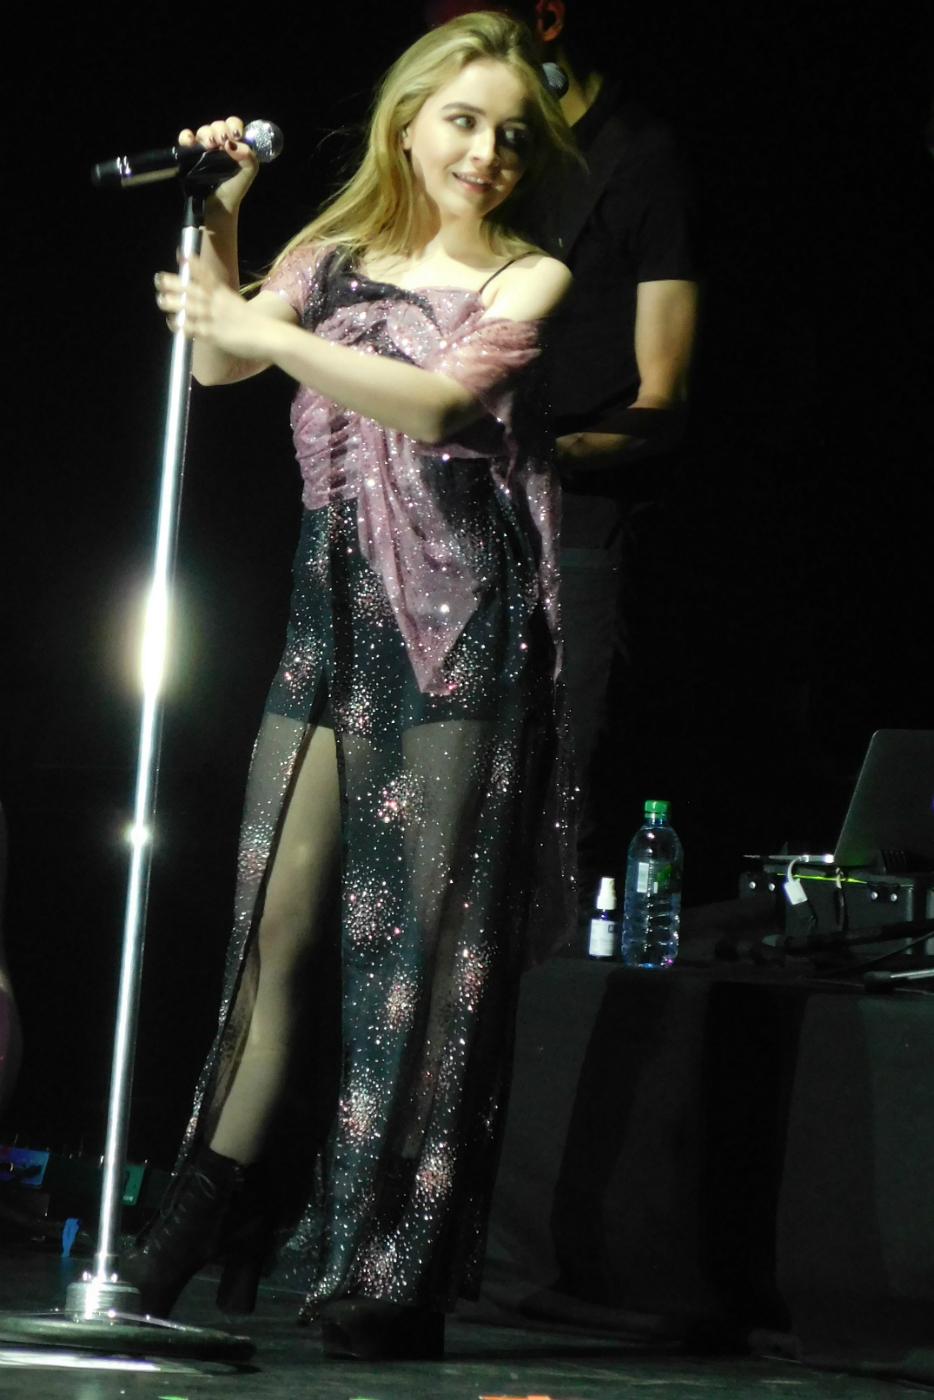 Sabrina Carpenter at Manchester Arena